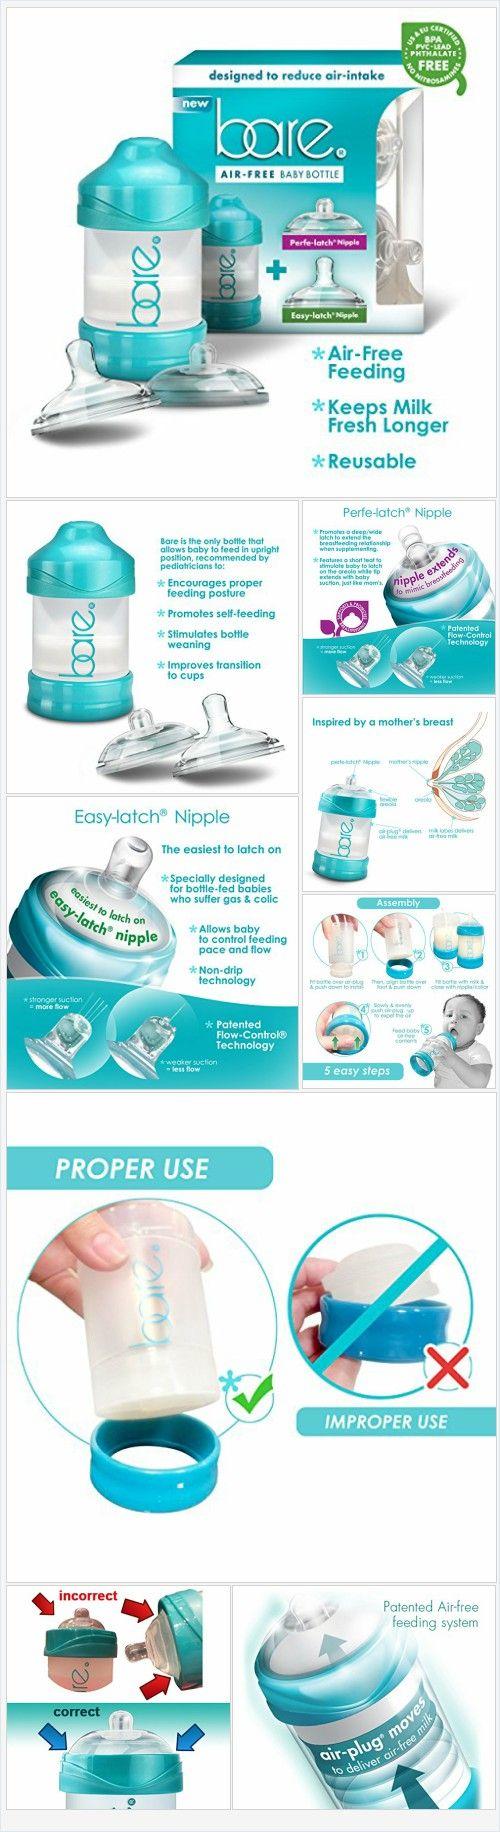 Bare® Baby Bottle w/ Breastfeeding & Bottle Feeding Nipples - Patented Air…